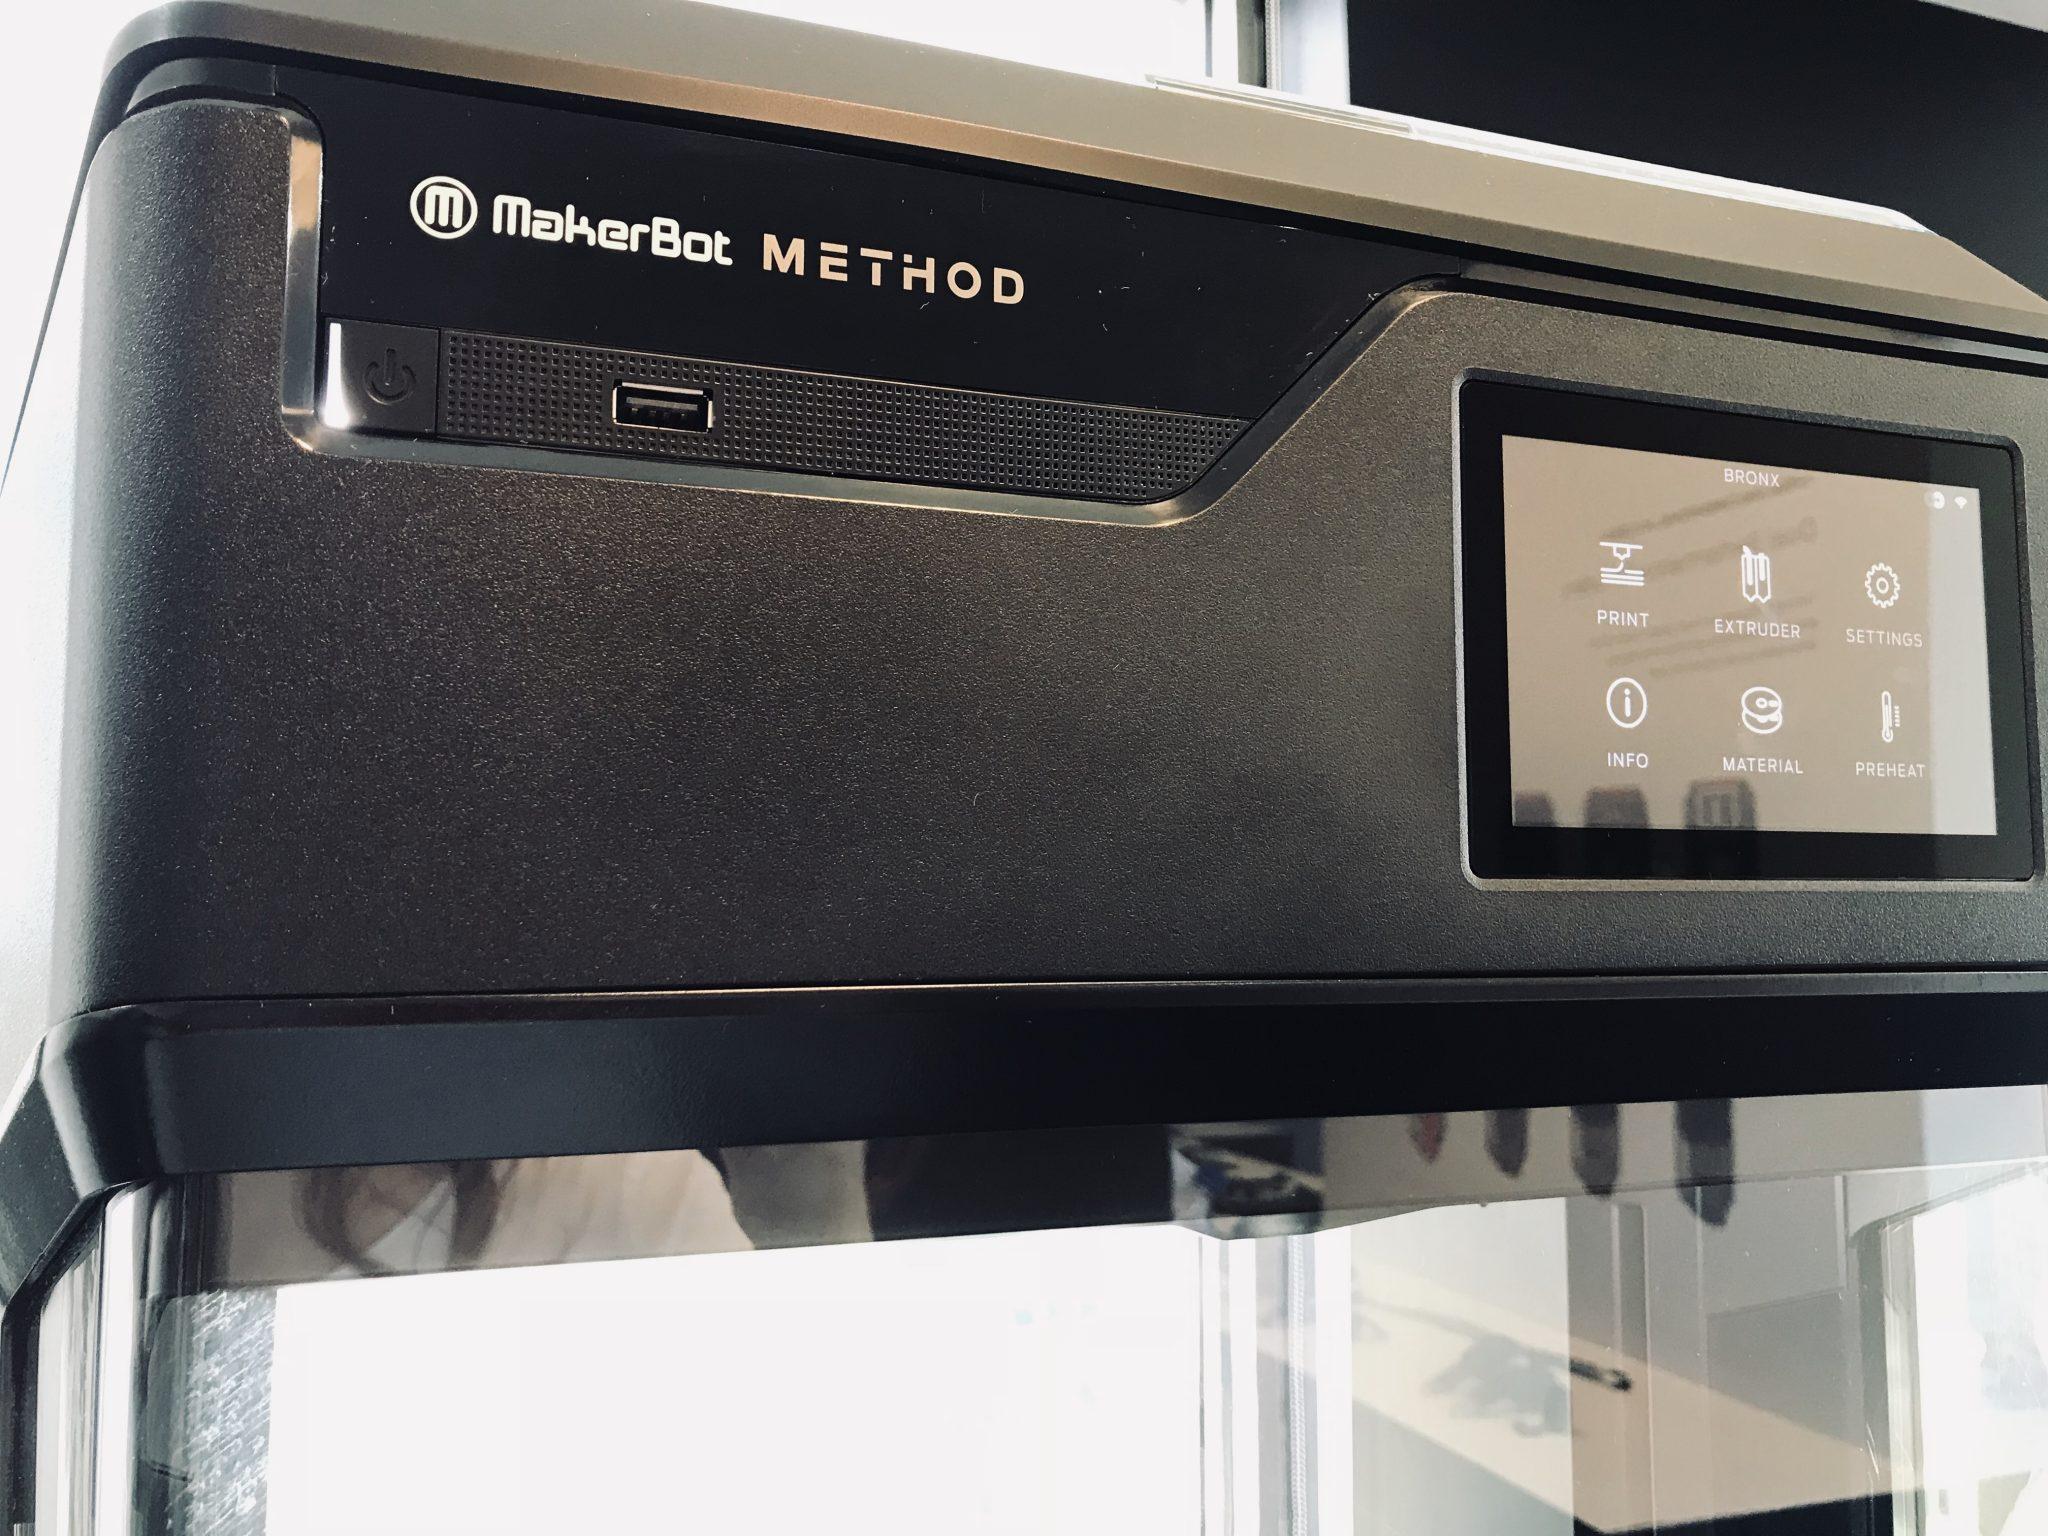 HQ Visit: MakerBot launches Method performance 3D printer